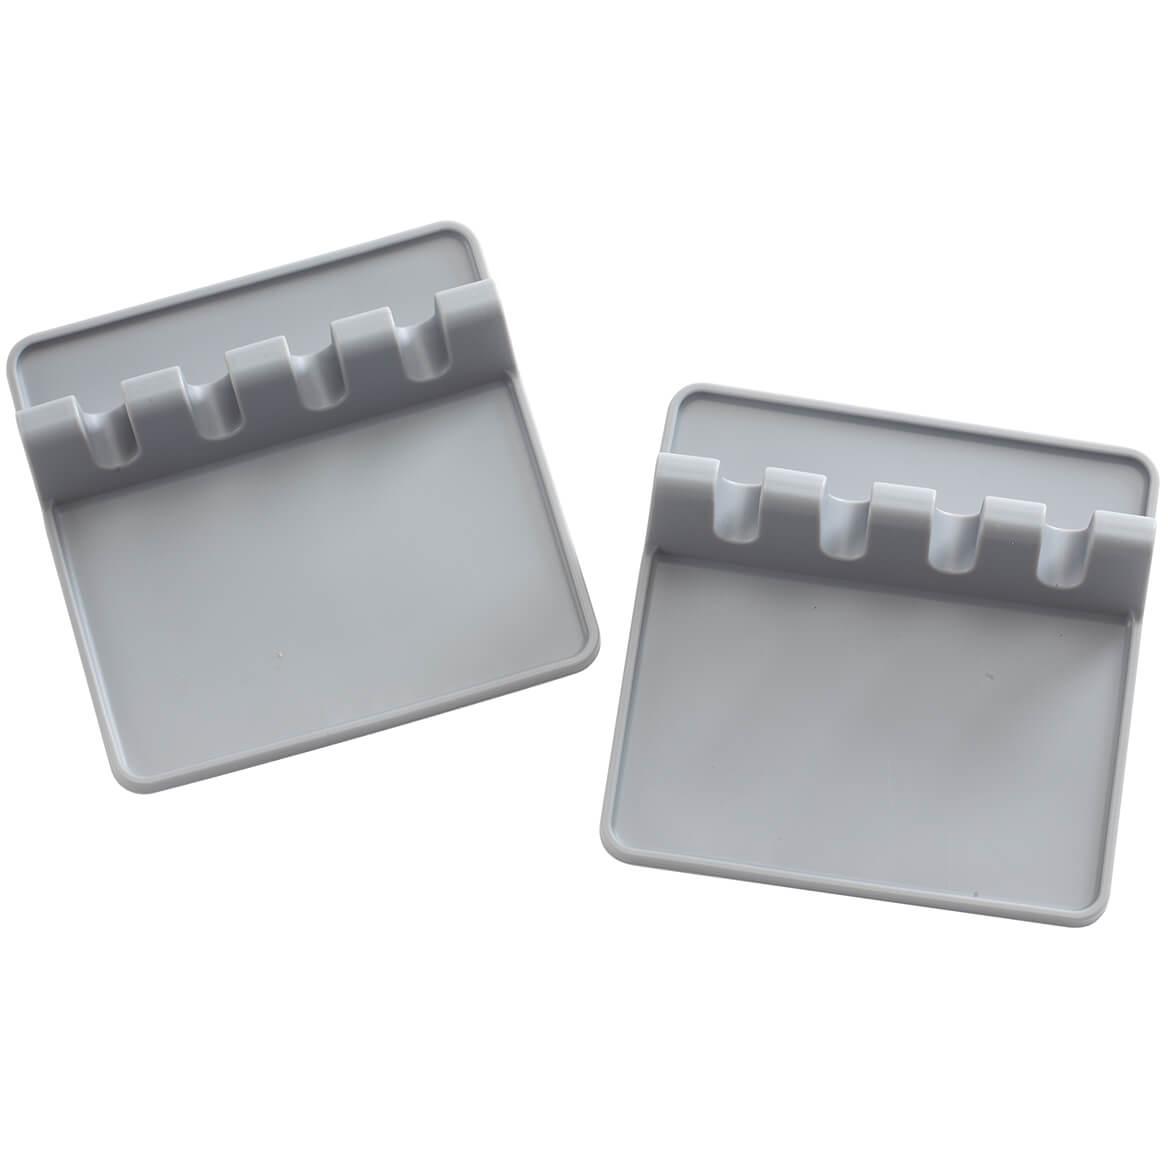 Silicone Tool Organizer Mat-370755